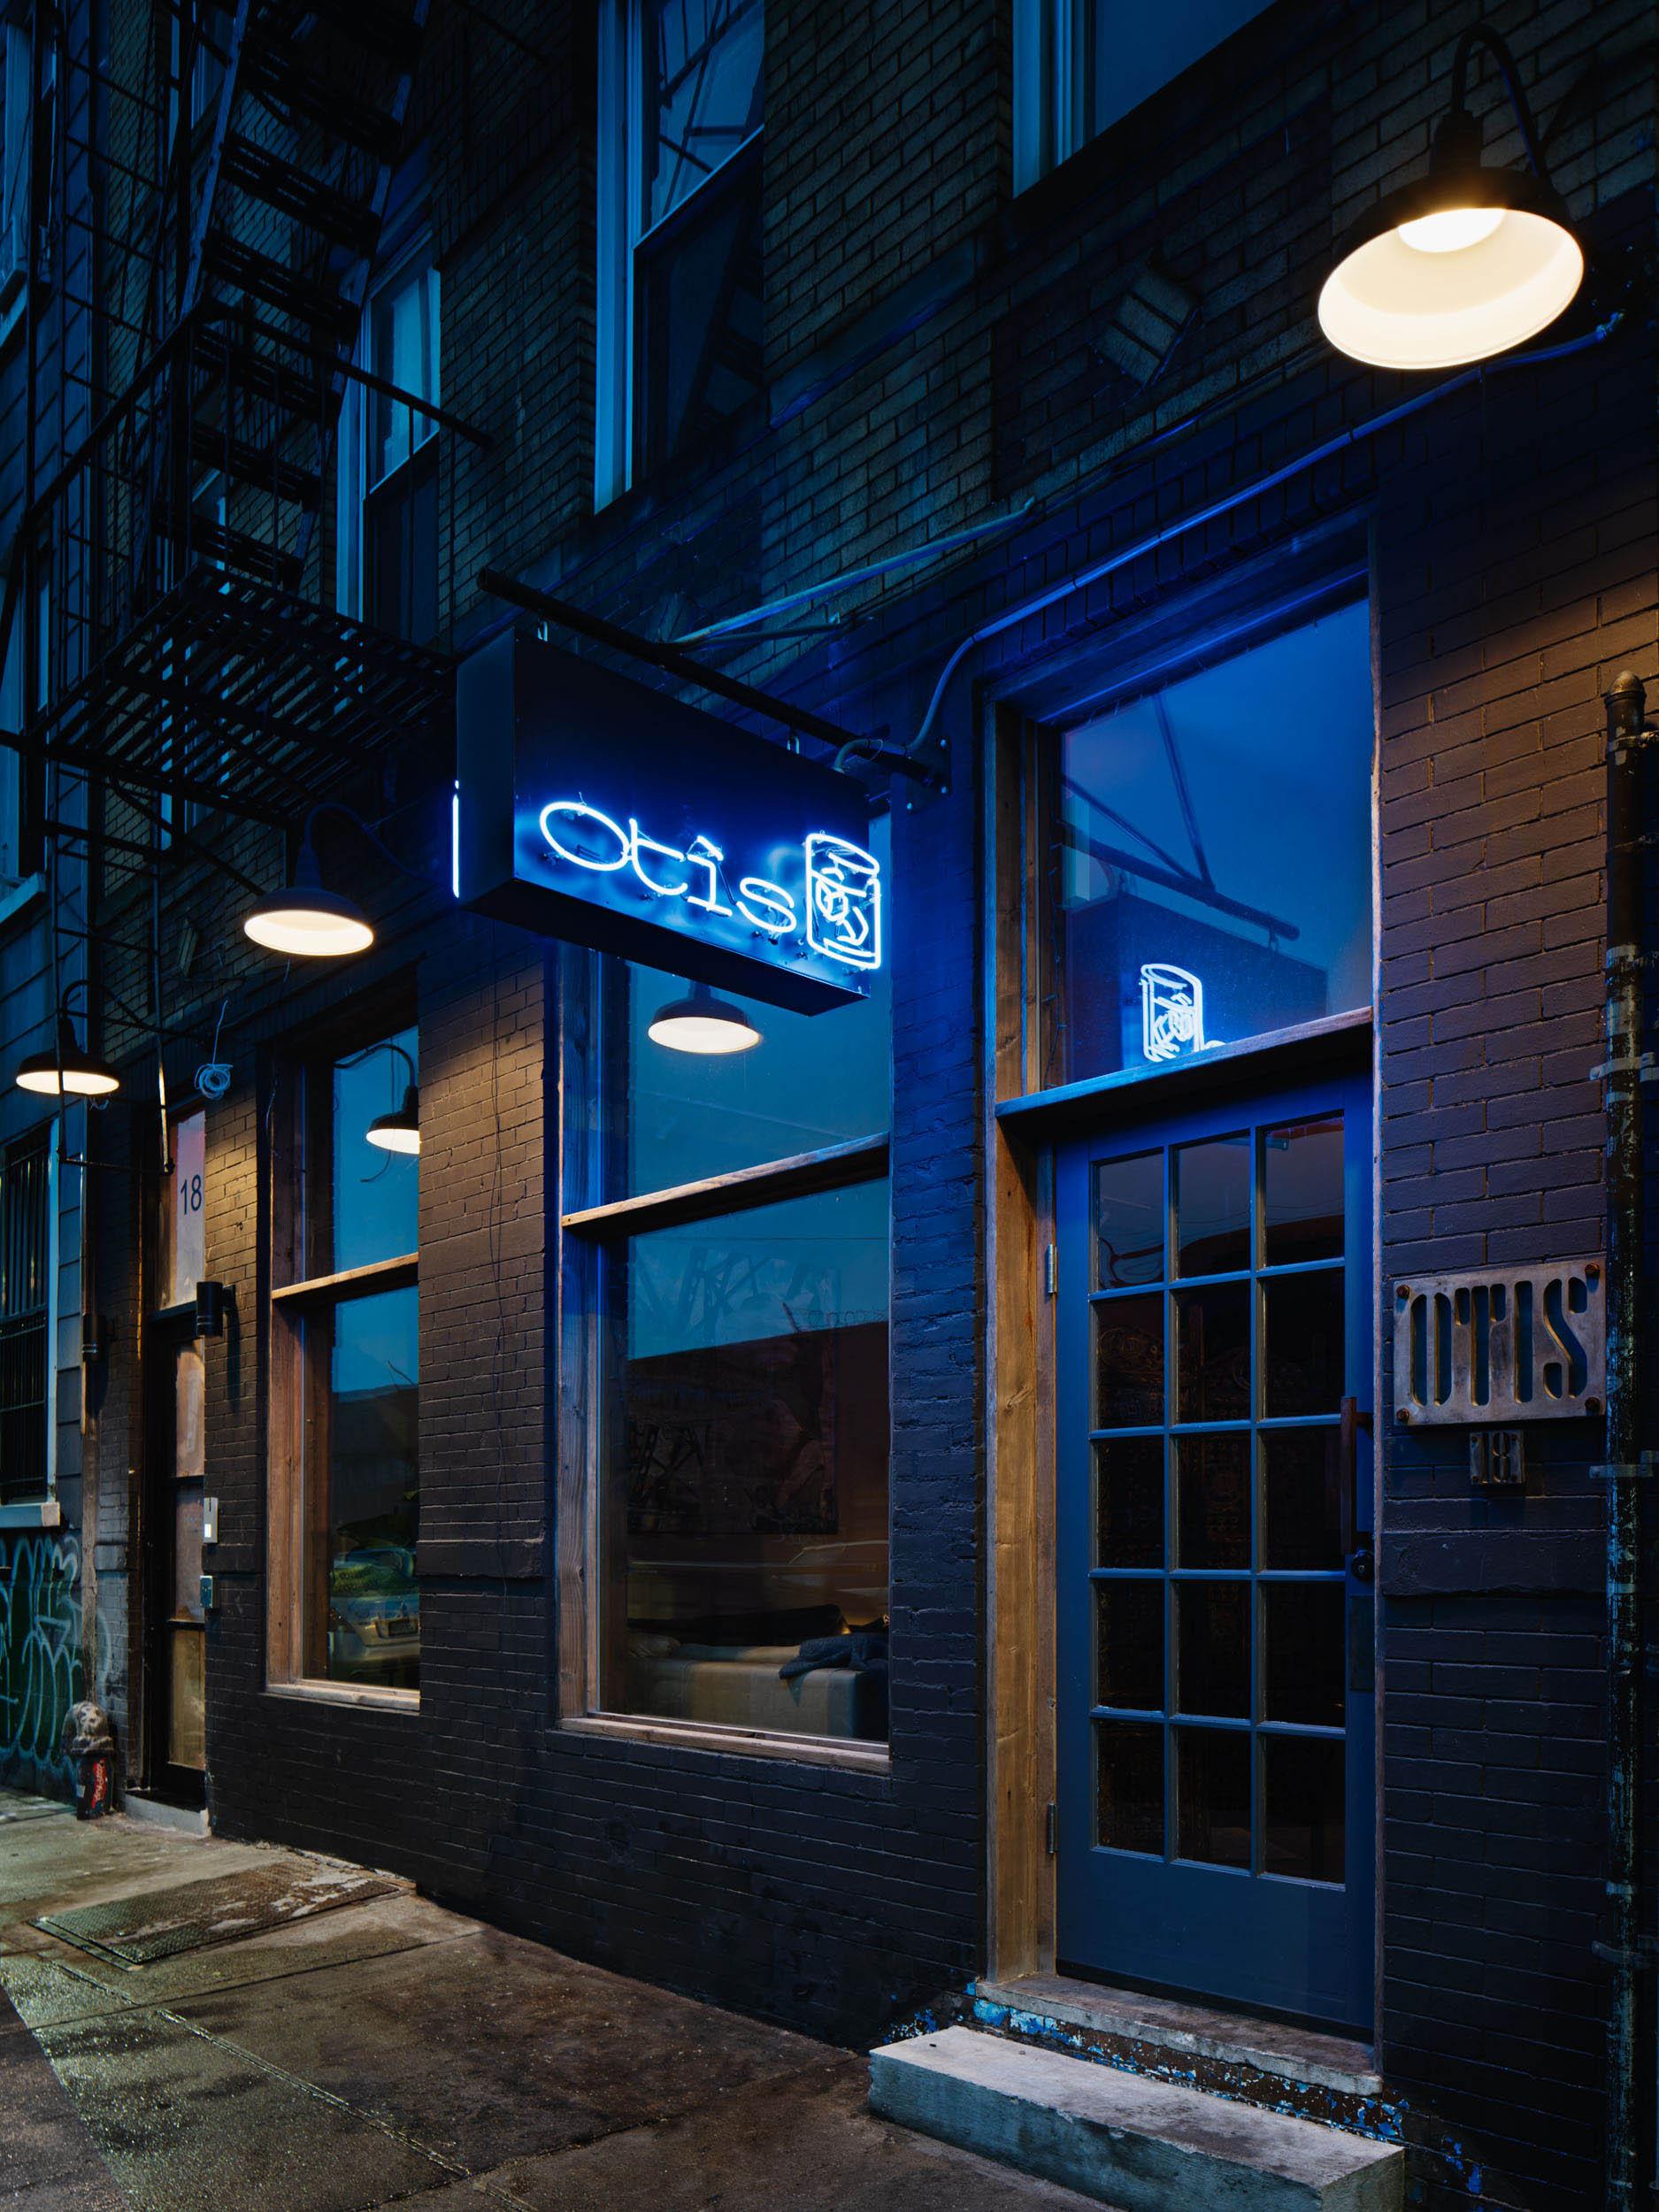 Otis Restaurant Bushwick, Brooklyn J_spy Architecture and Design